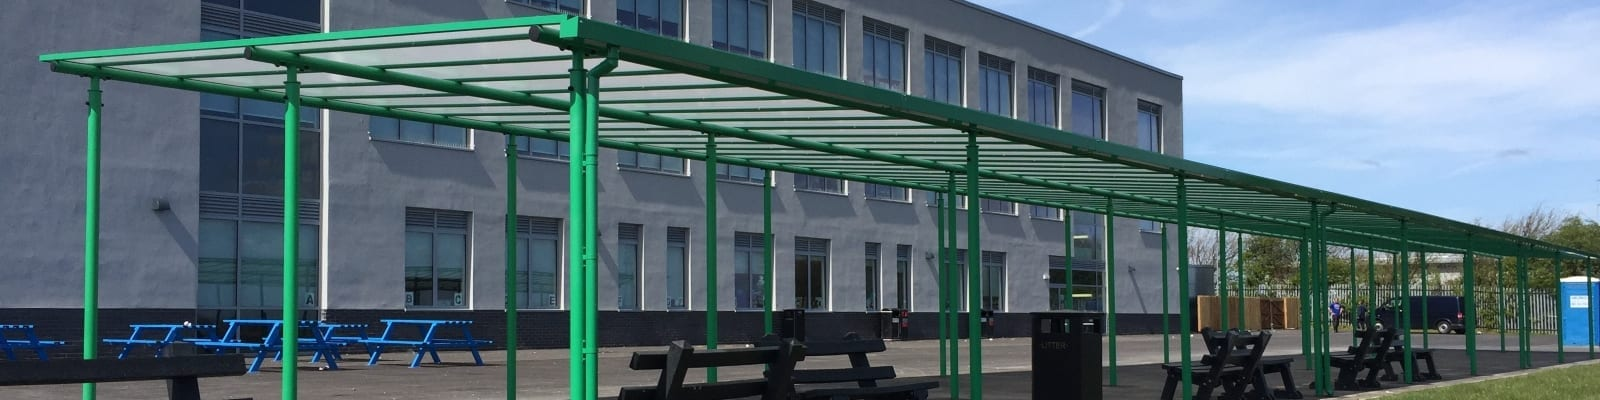 Blackpool Aspire Academy Green Shelter